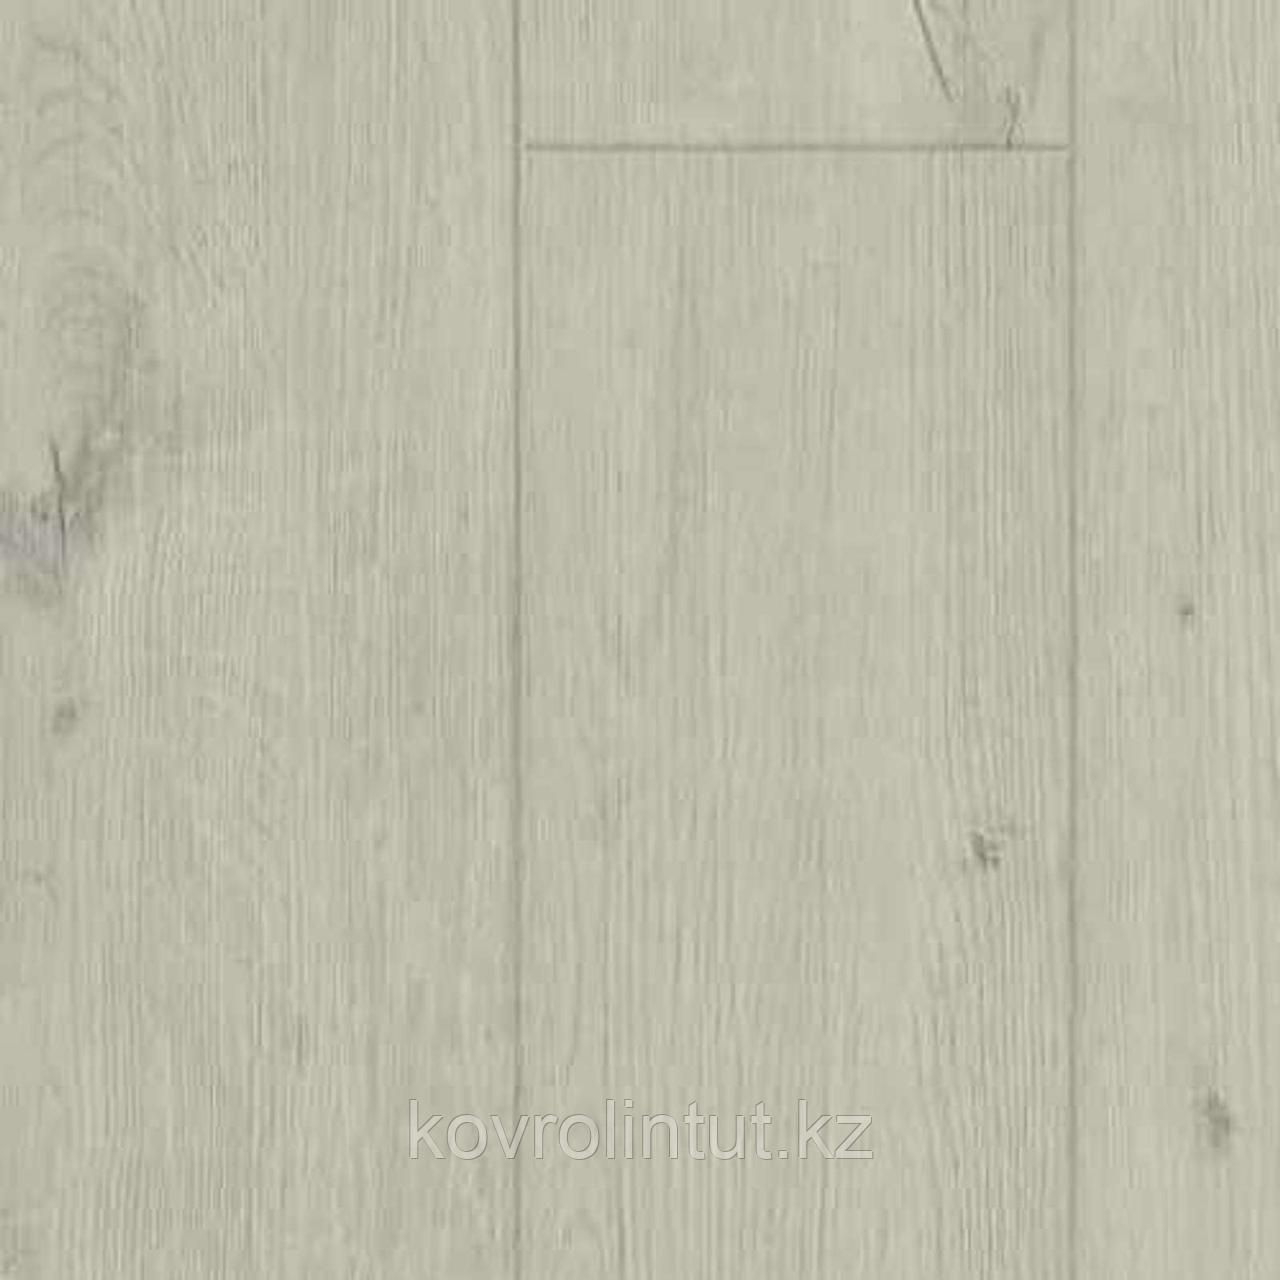 Плитка ПВХ клеевая Arbiton Aroq Bergen Oak DA103